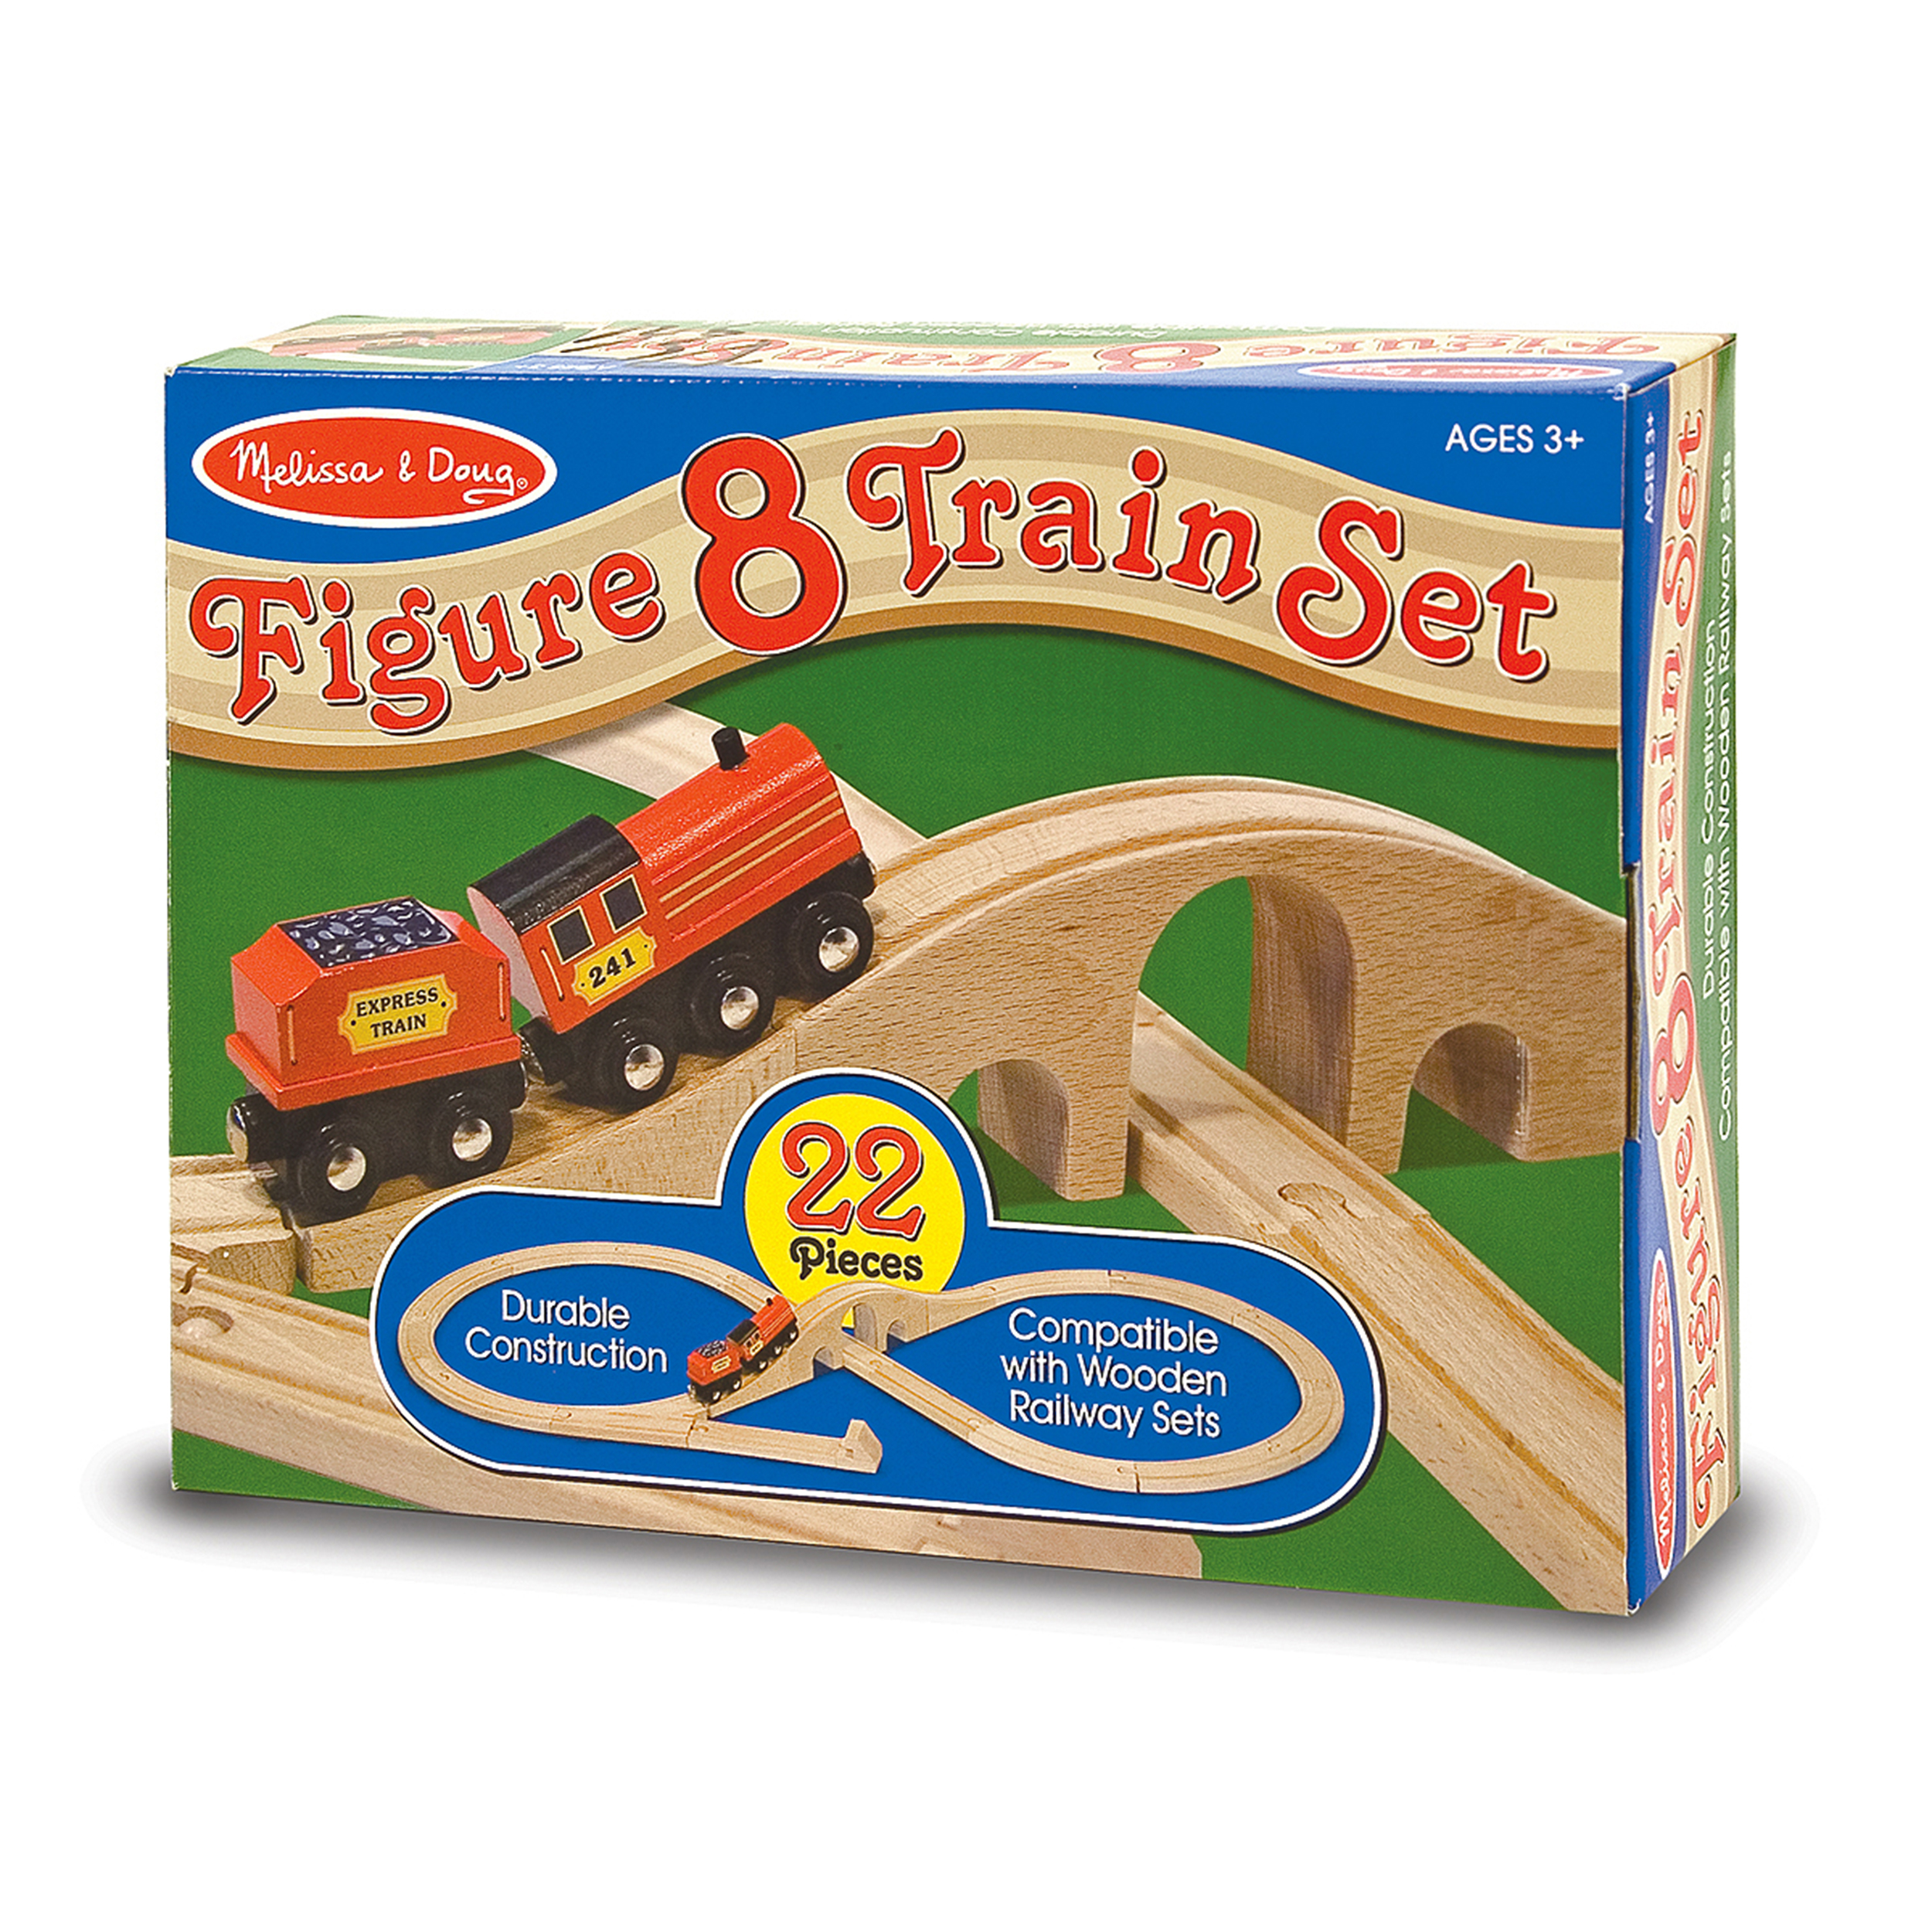 Melissa & Doug Figure 8 Train Set